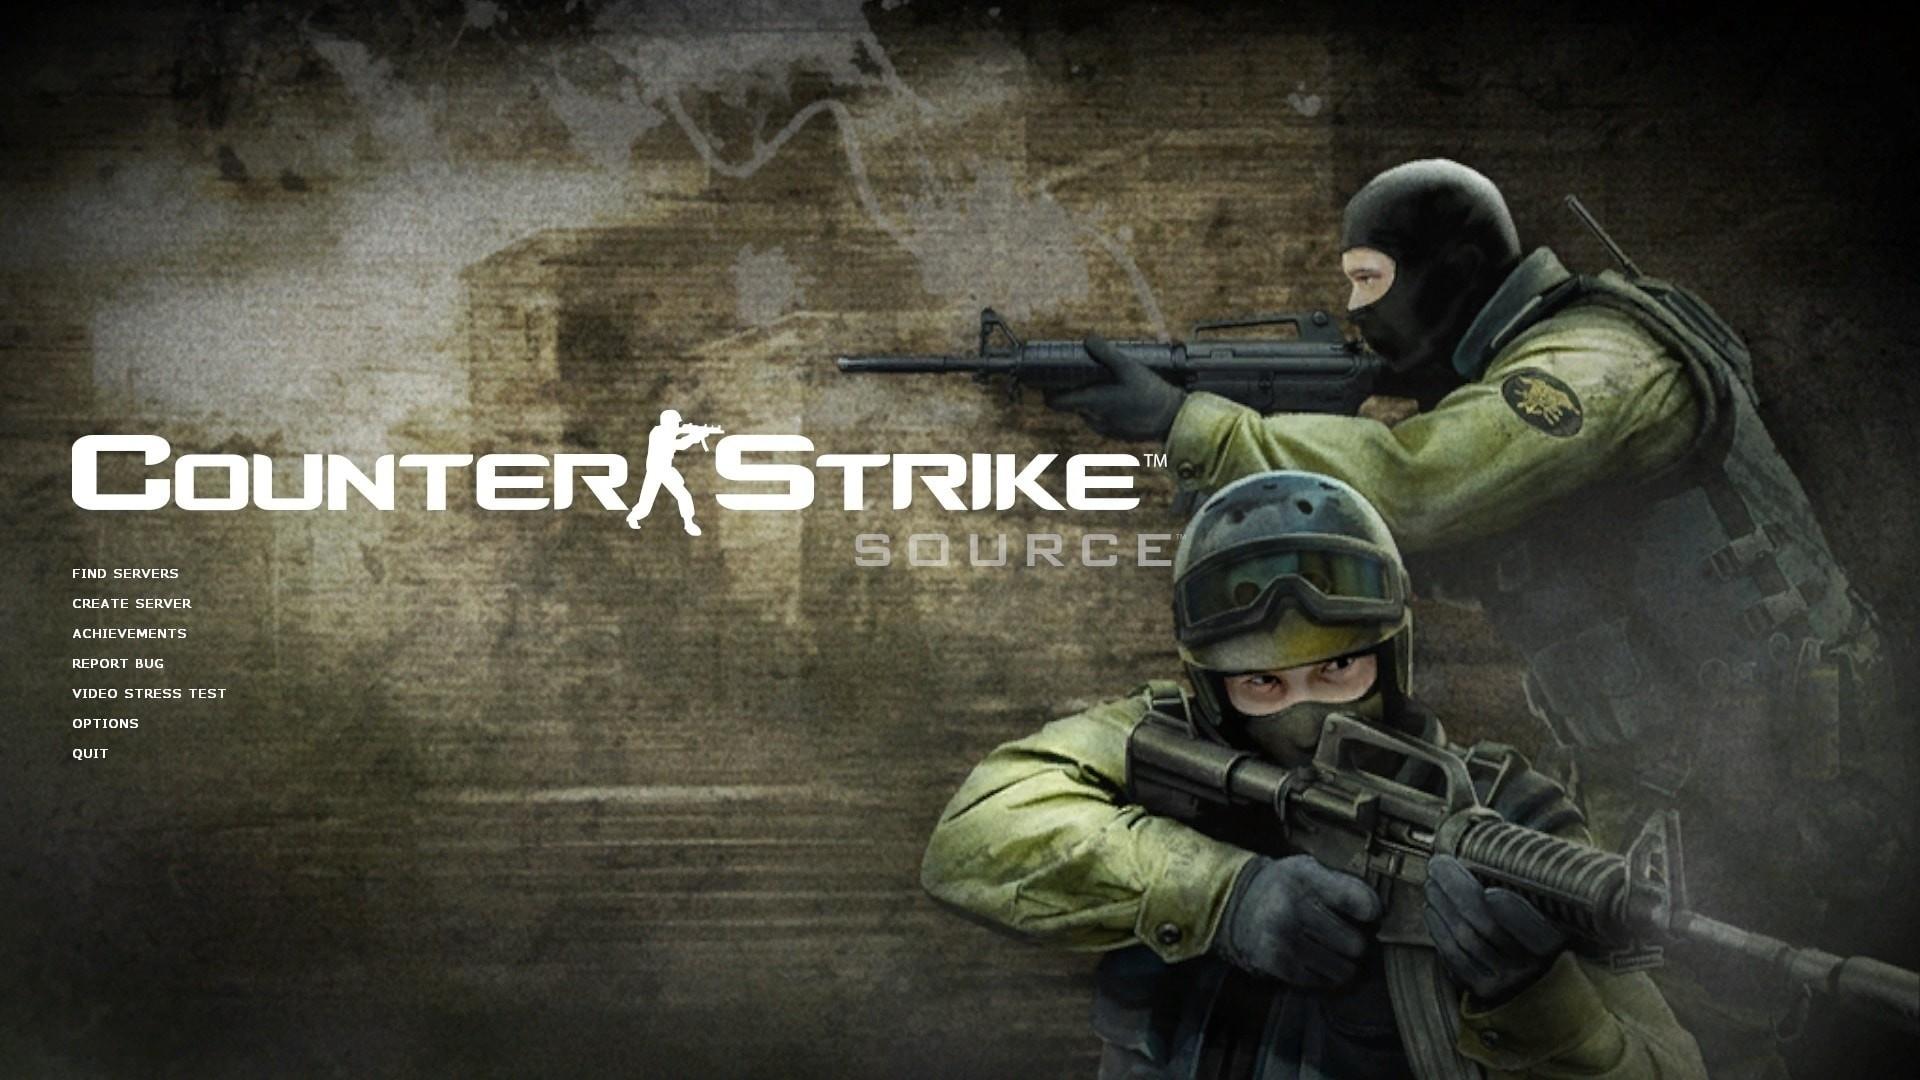 counter strike source wallpaper ·①